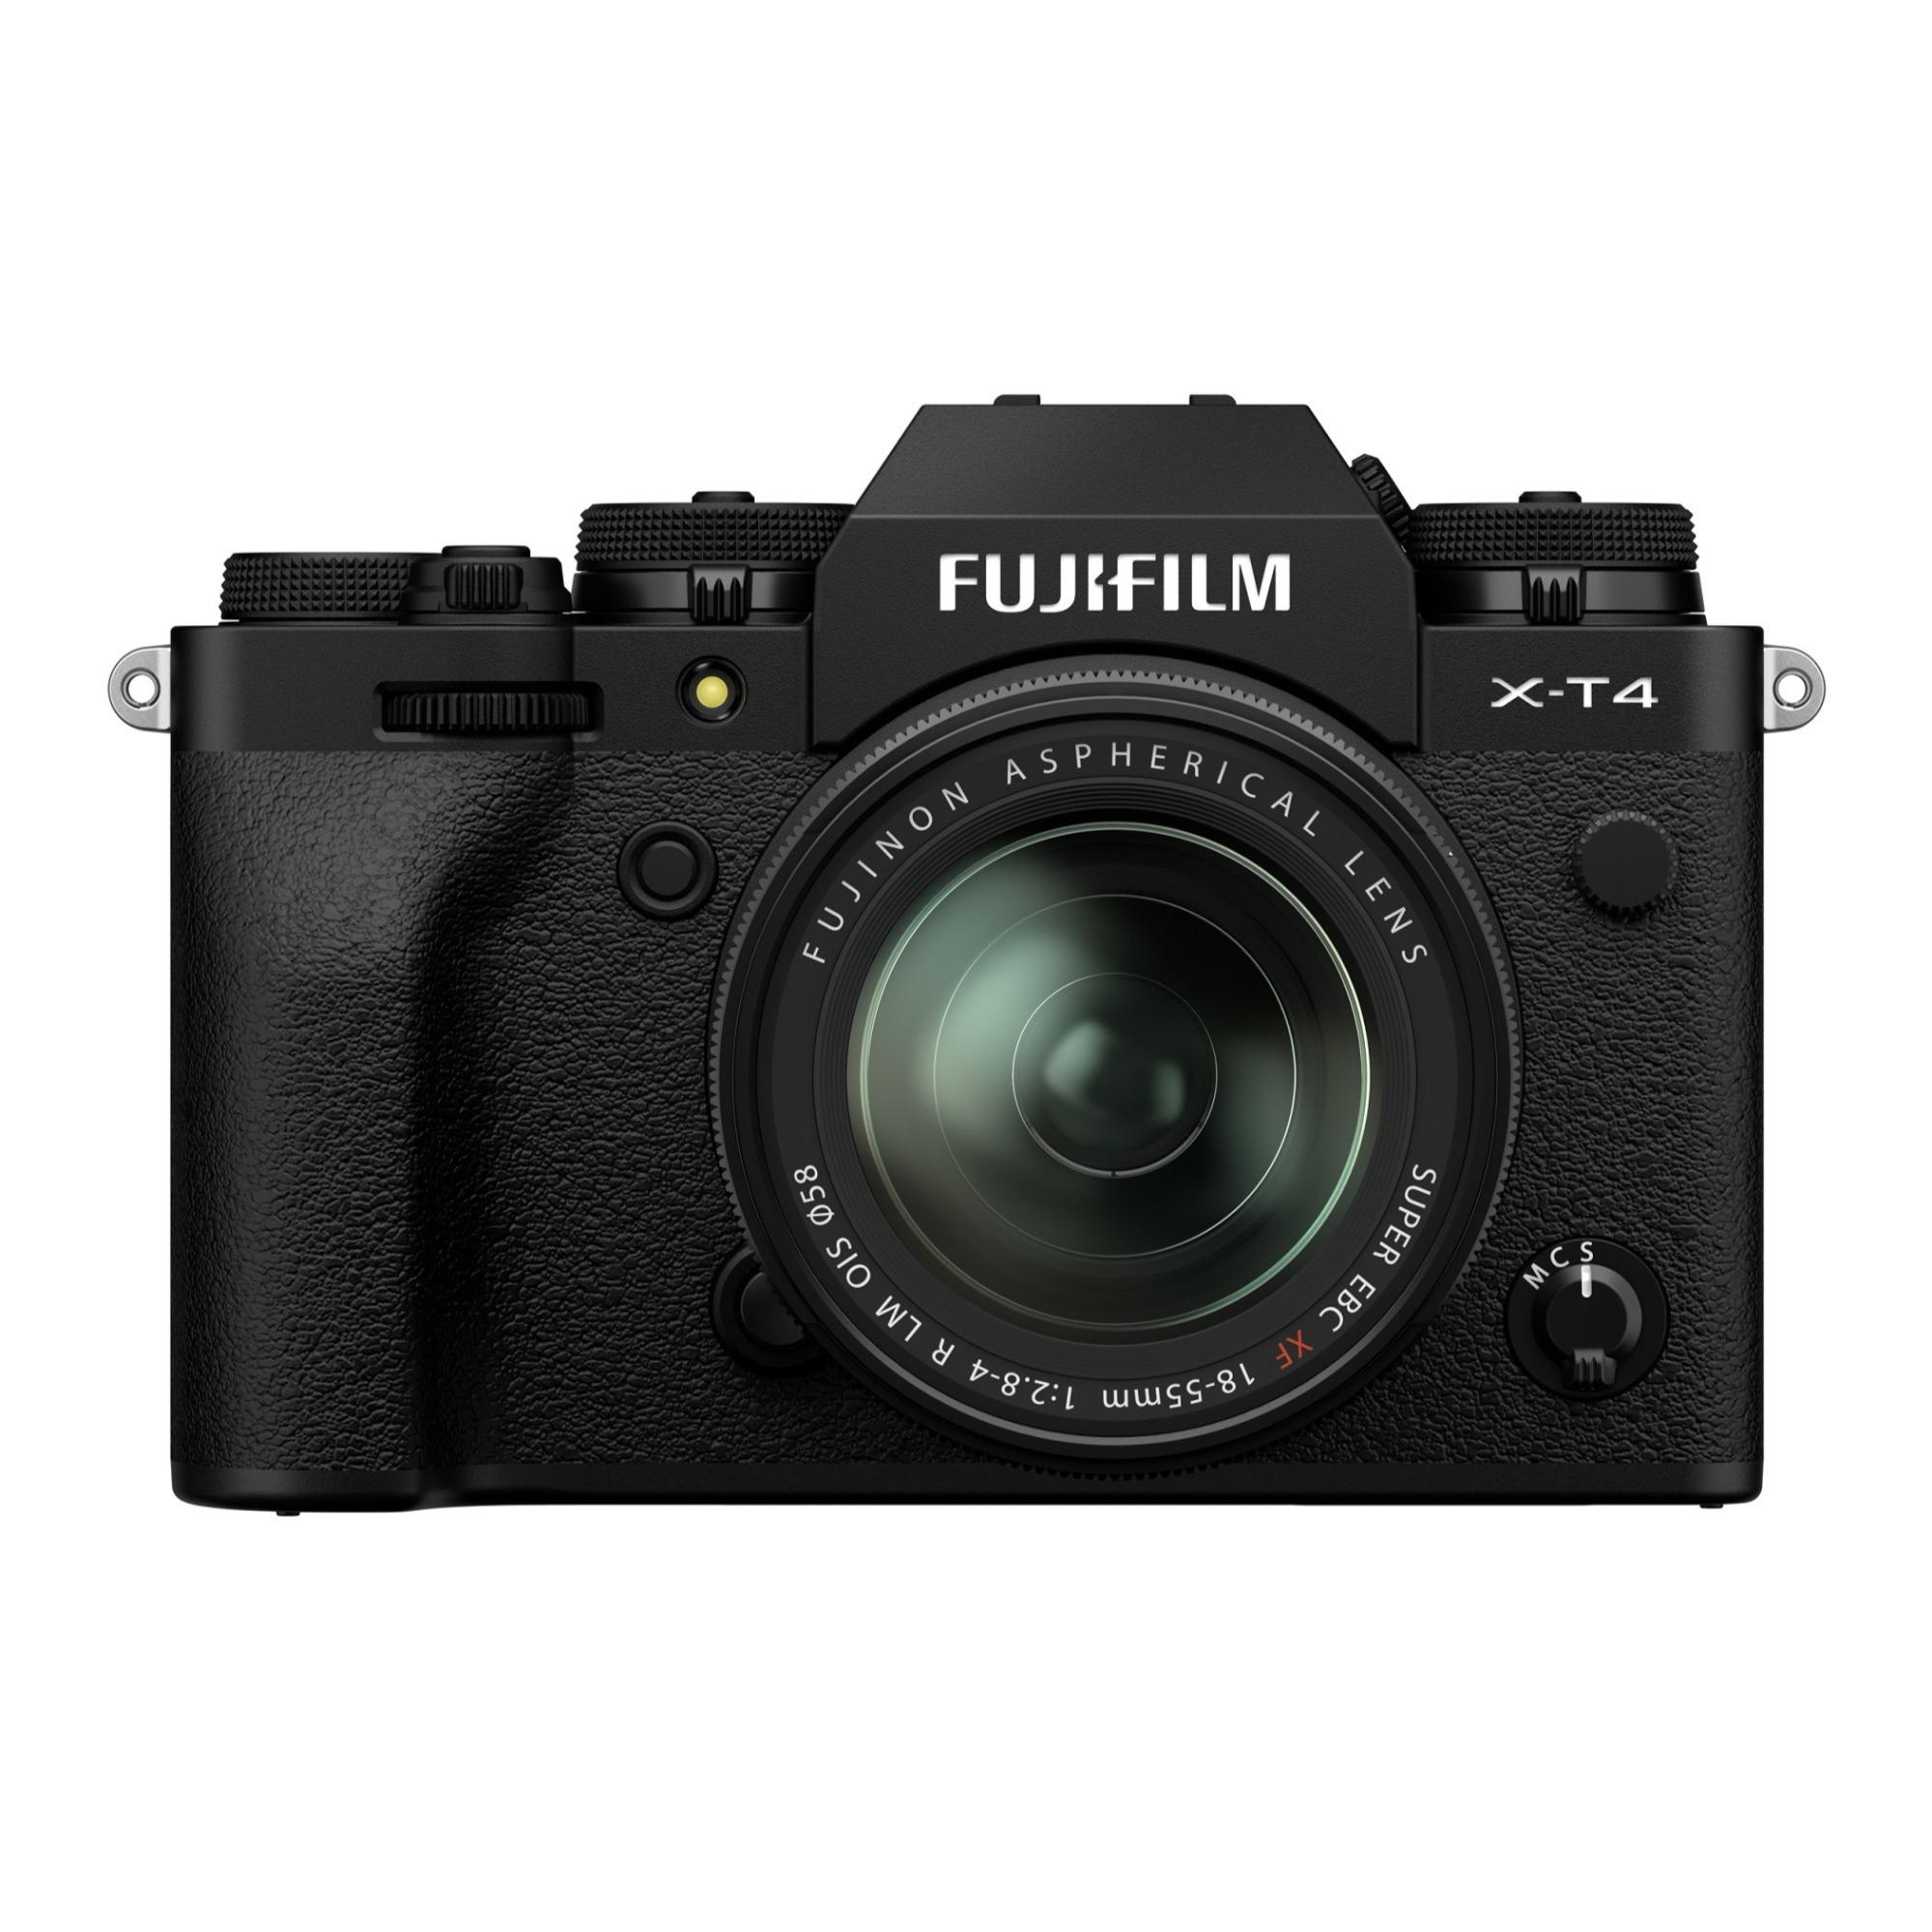 FUJIFILM(富士フイルム) X-T4 XF16-80mmF4 R OIS WR デジタルカメラ レンズキット X-T4LK-1680-B